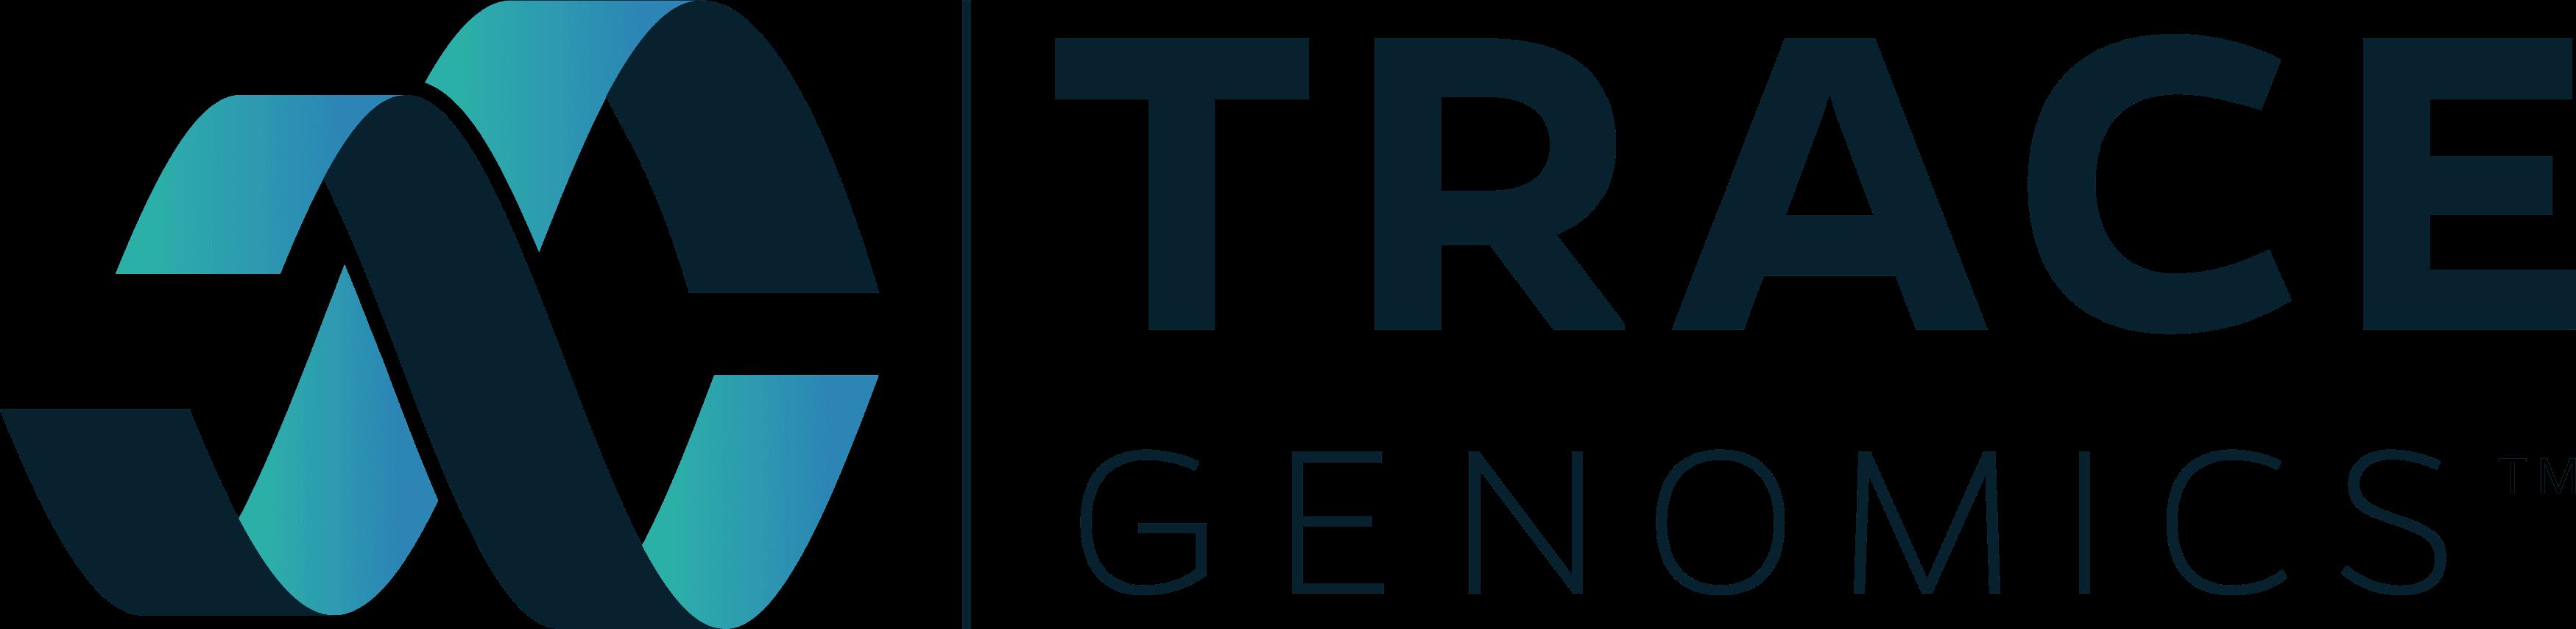 Trace Genomics logo